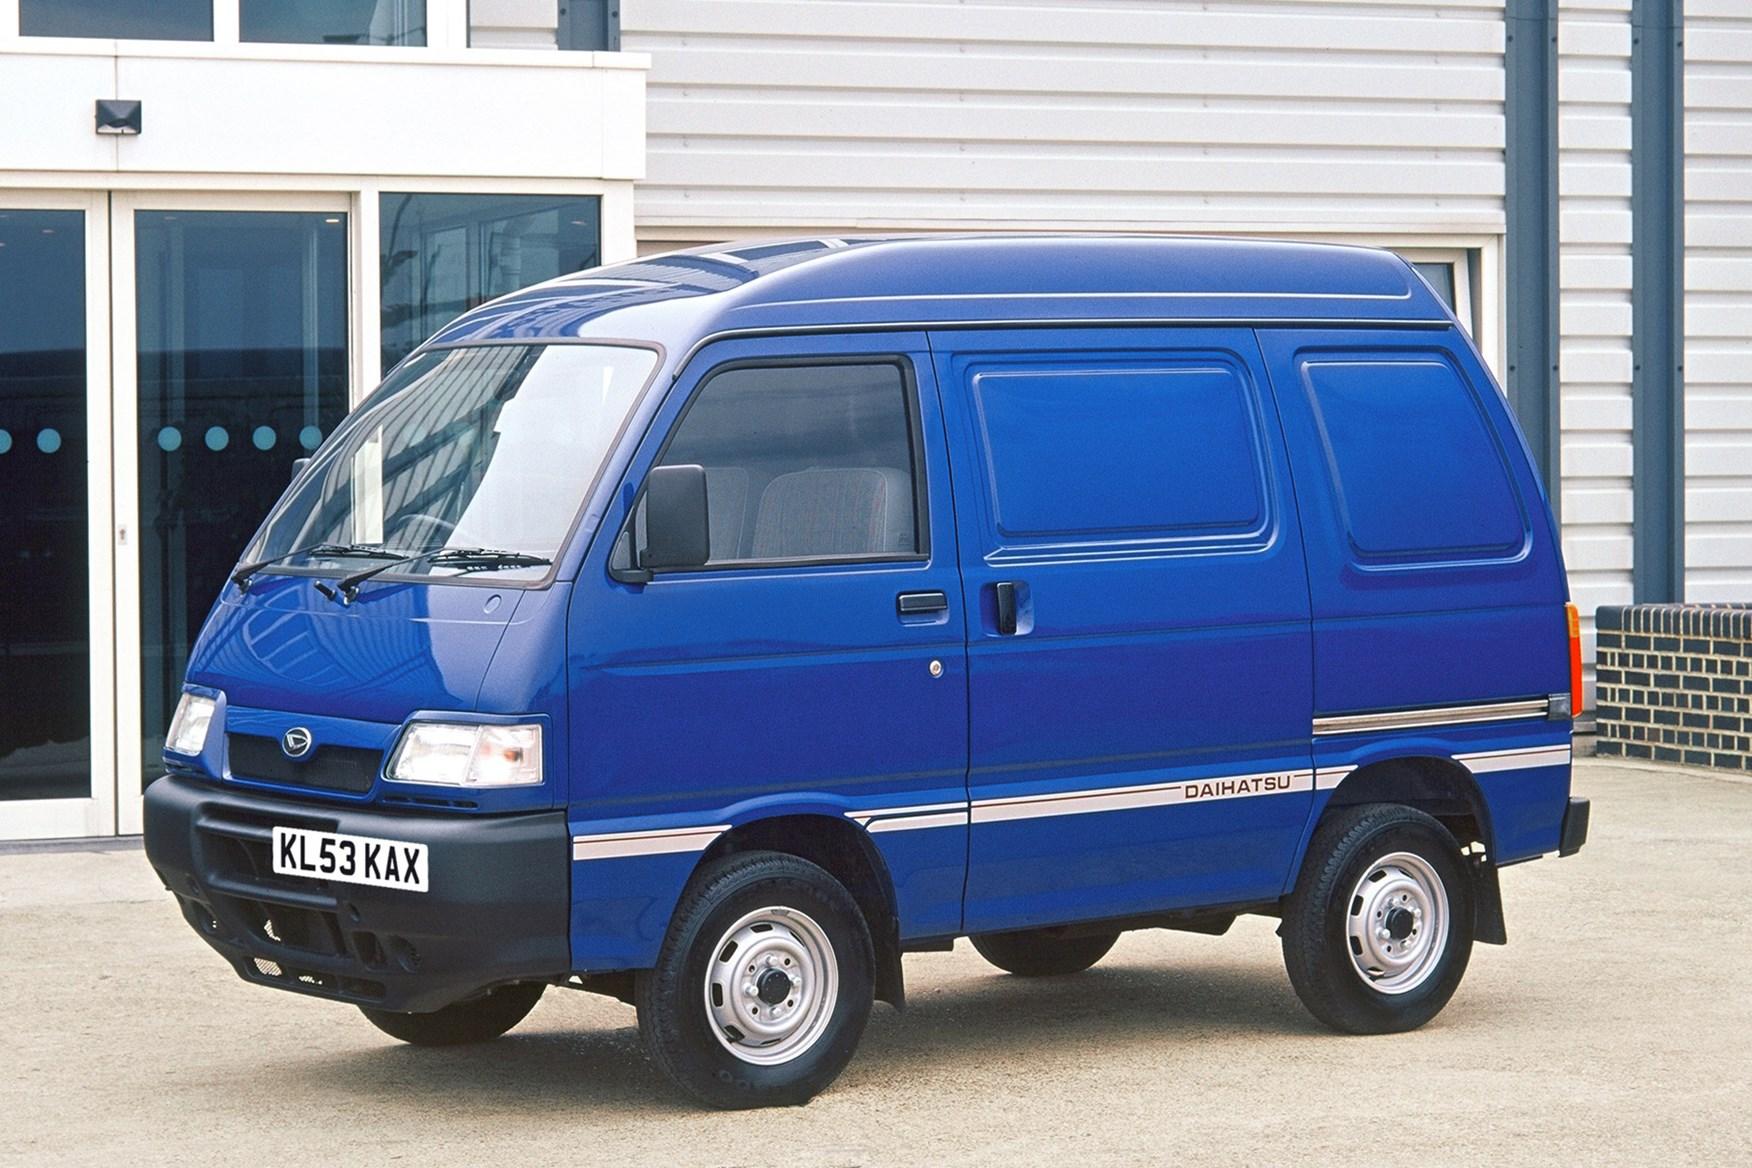 Daihatsu Hijet Van Review (1986-2004)